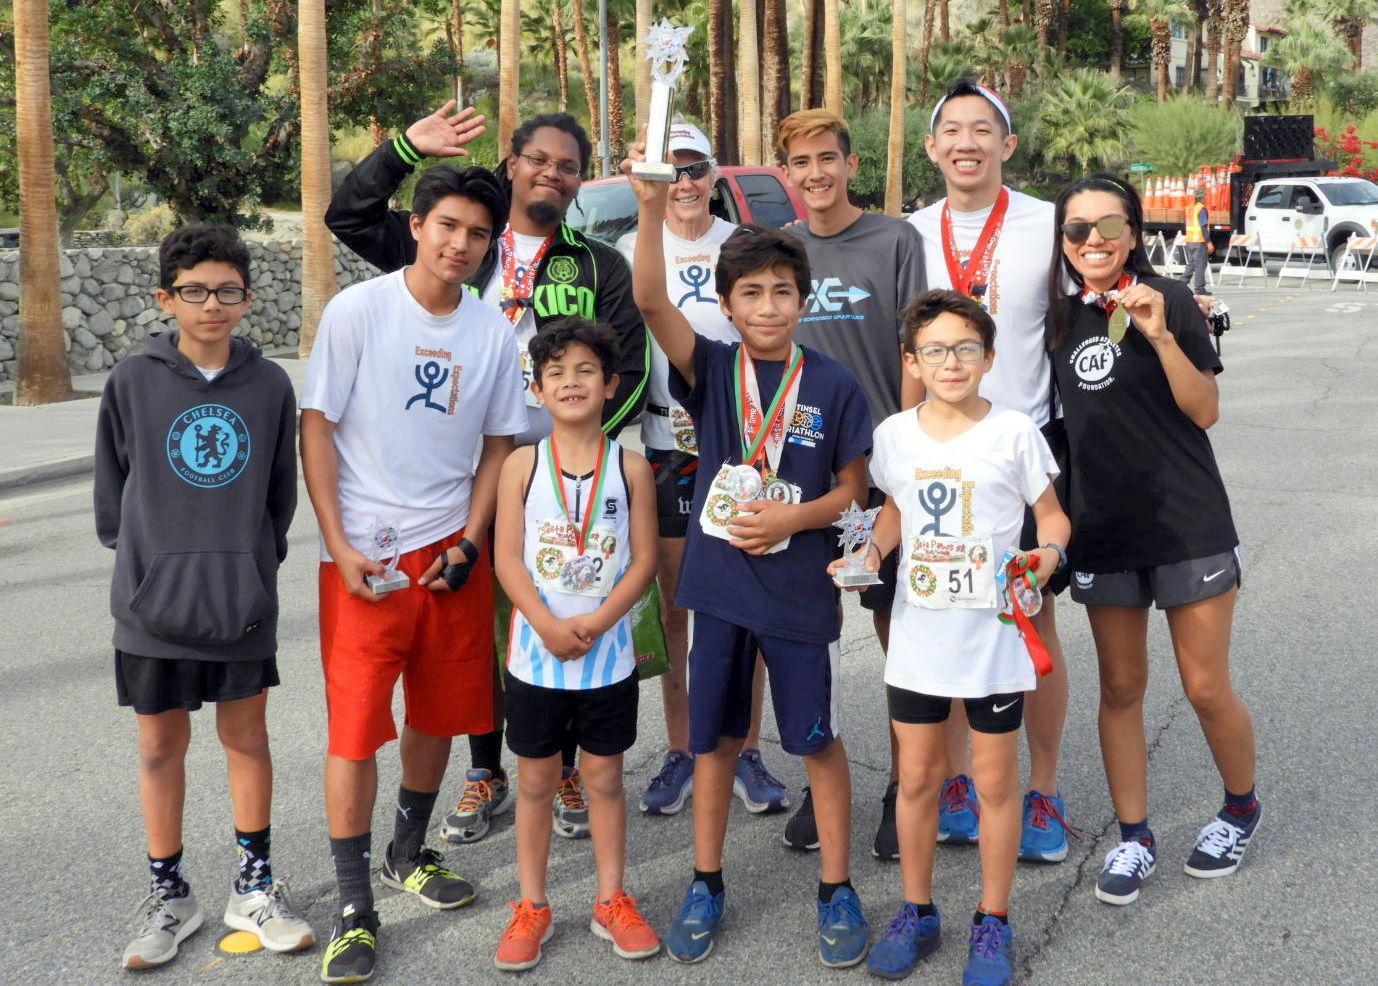 Santa-Paws-2018-team-trophy